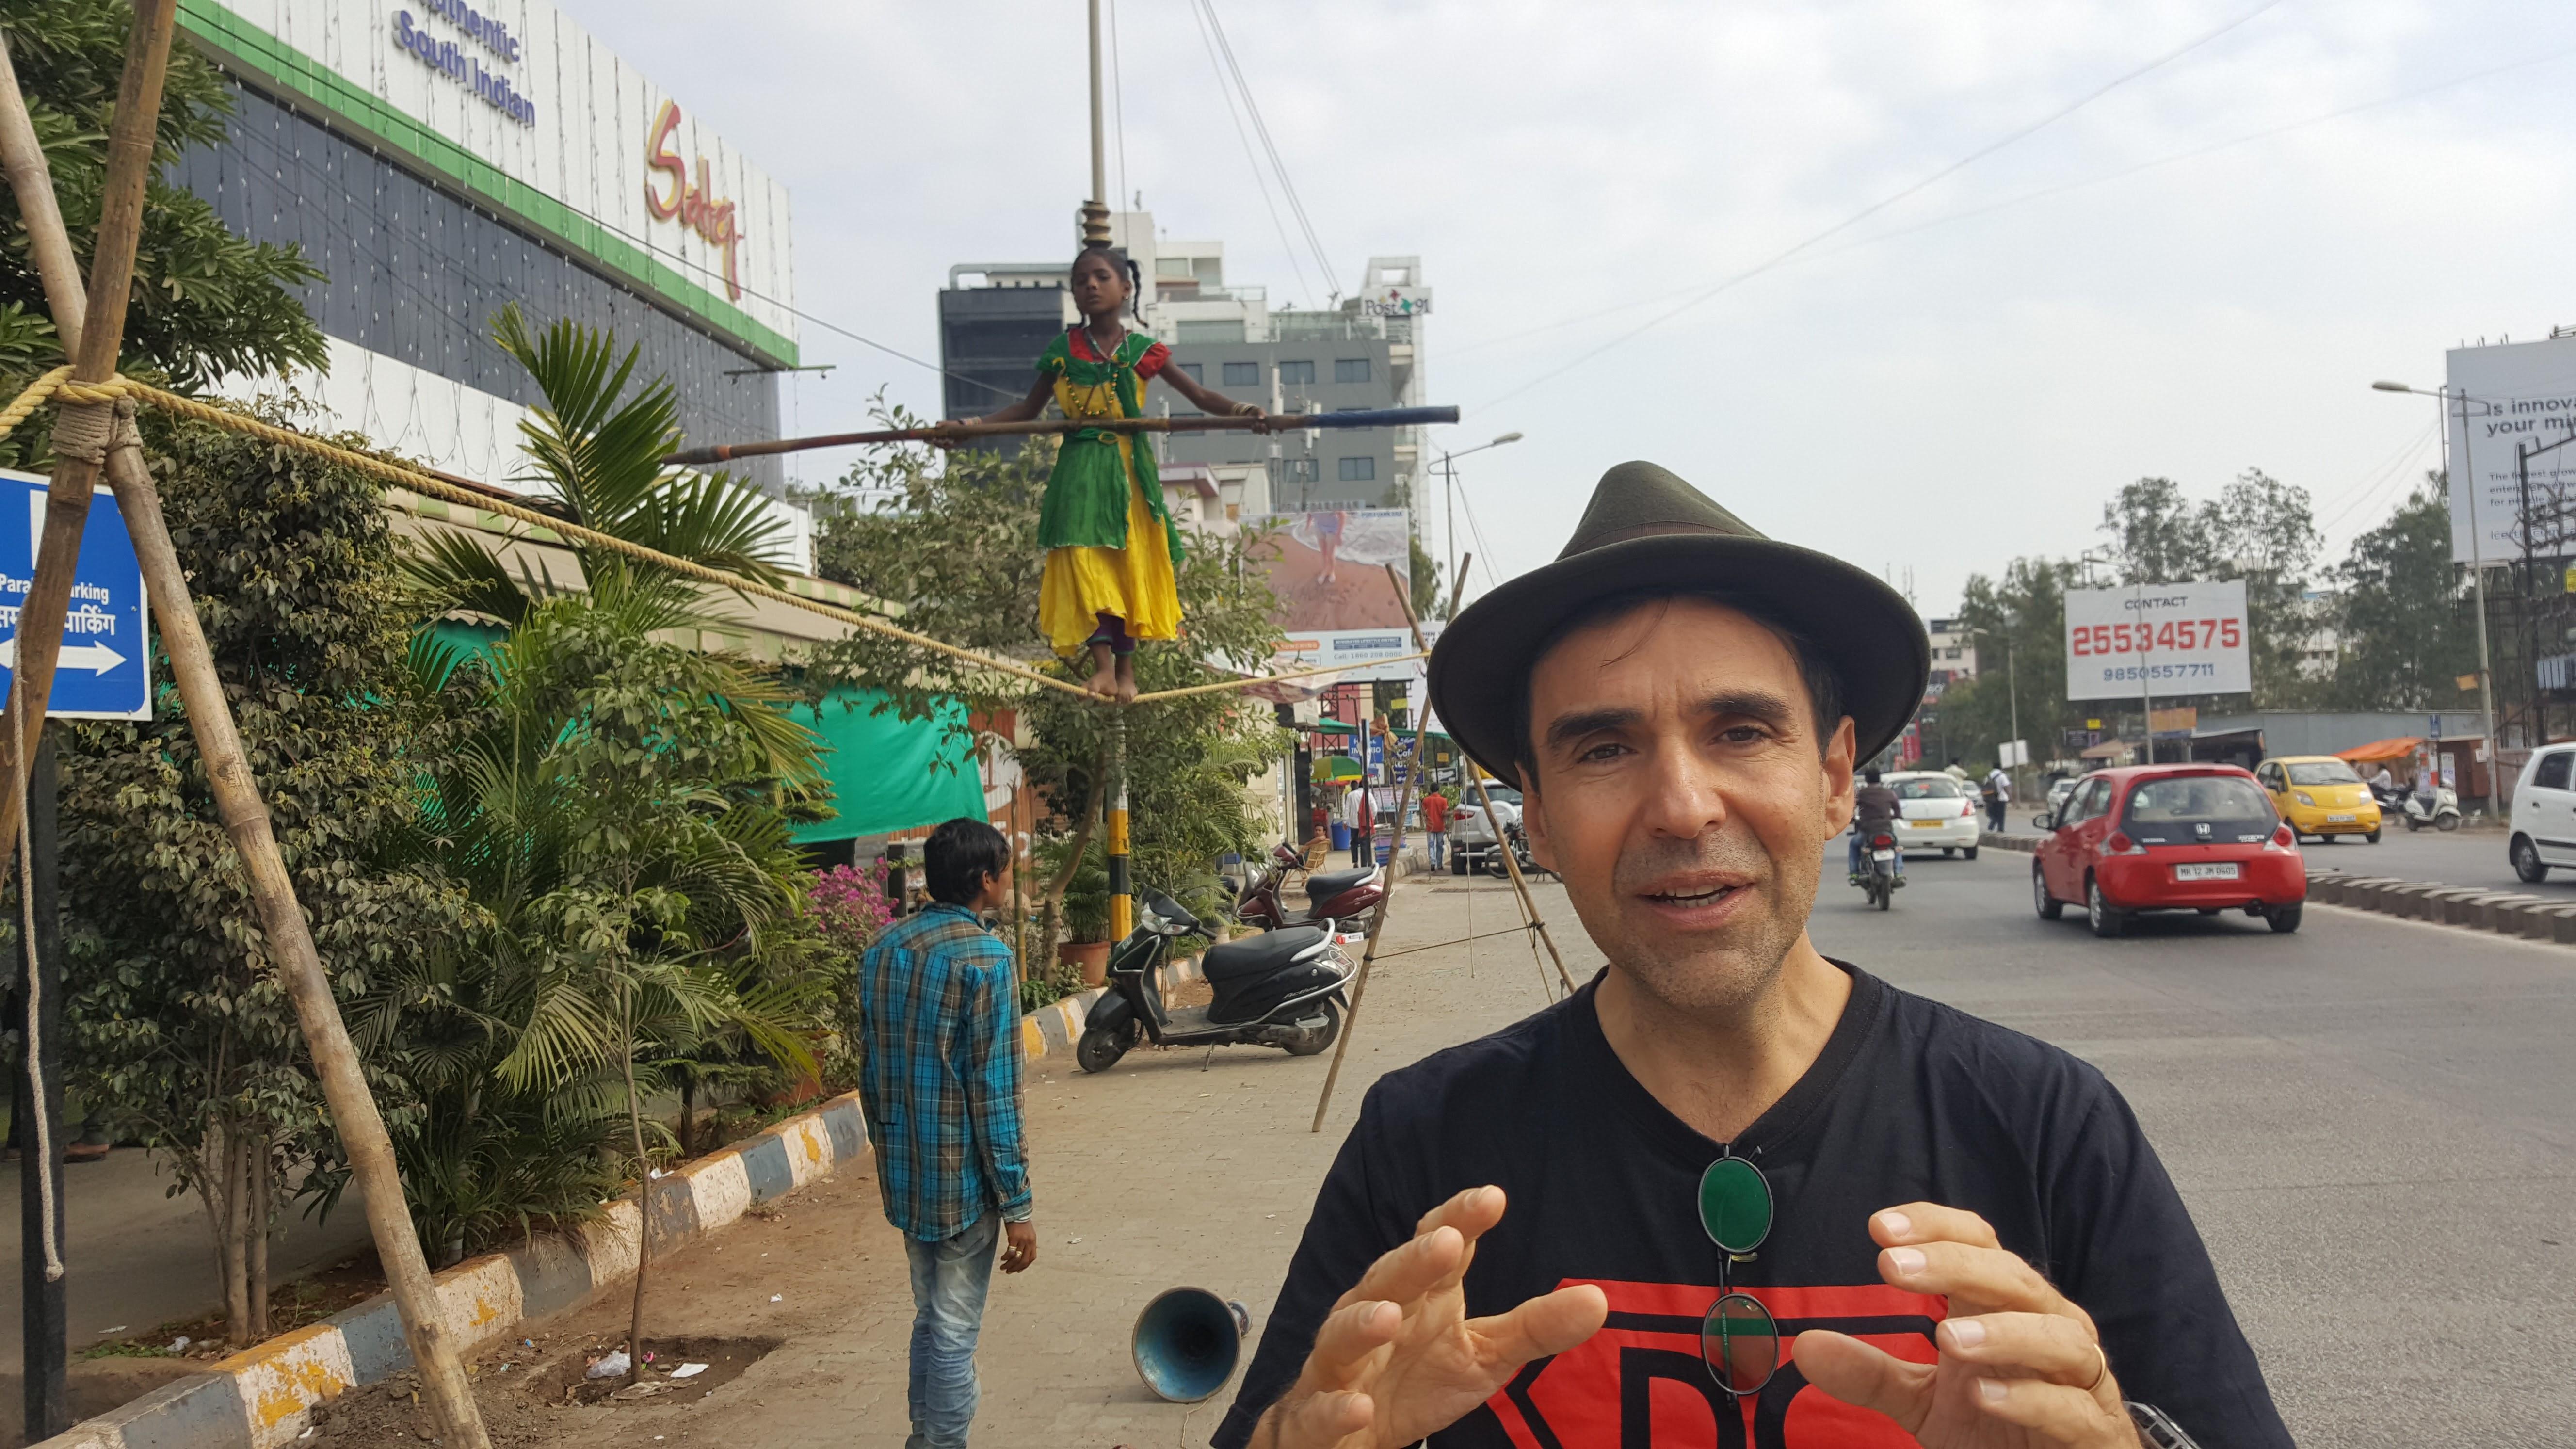 Arthur Carmazzi in Pune